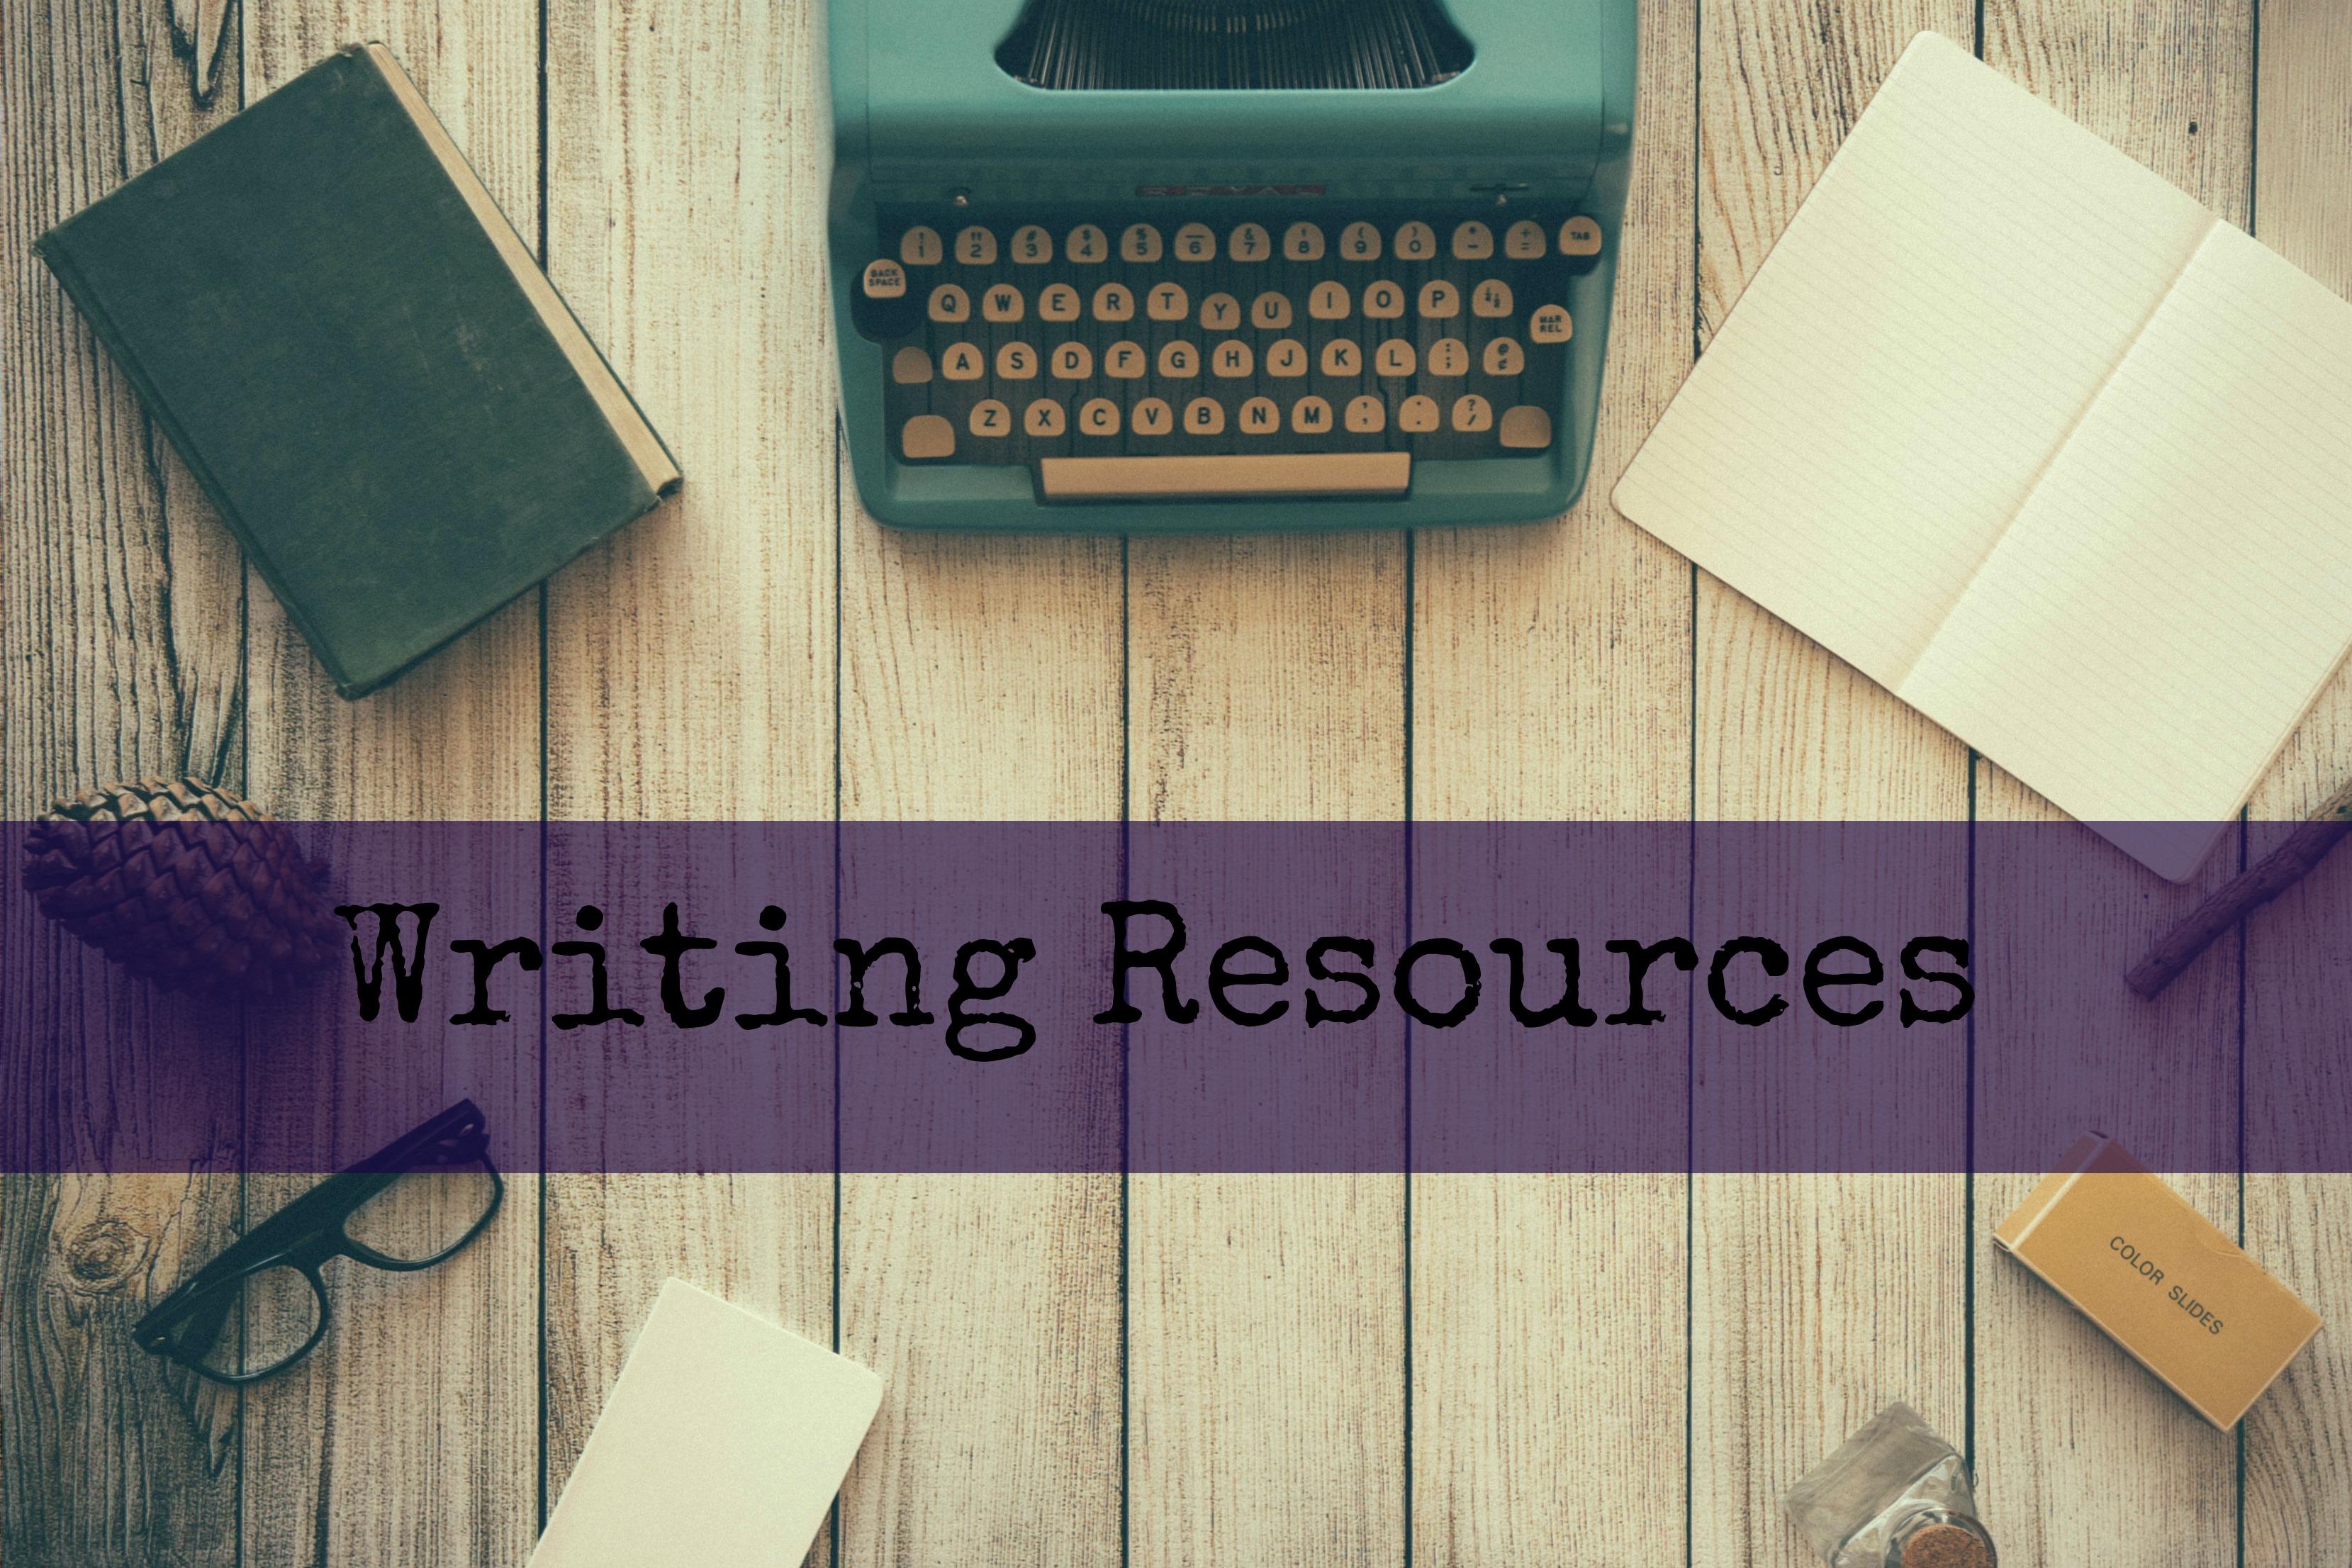 old typwriter and book supplies resources banner jpeg